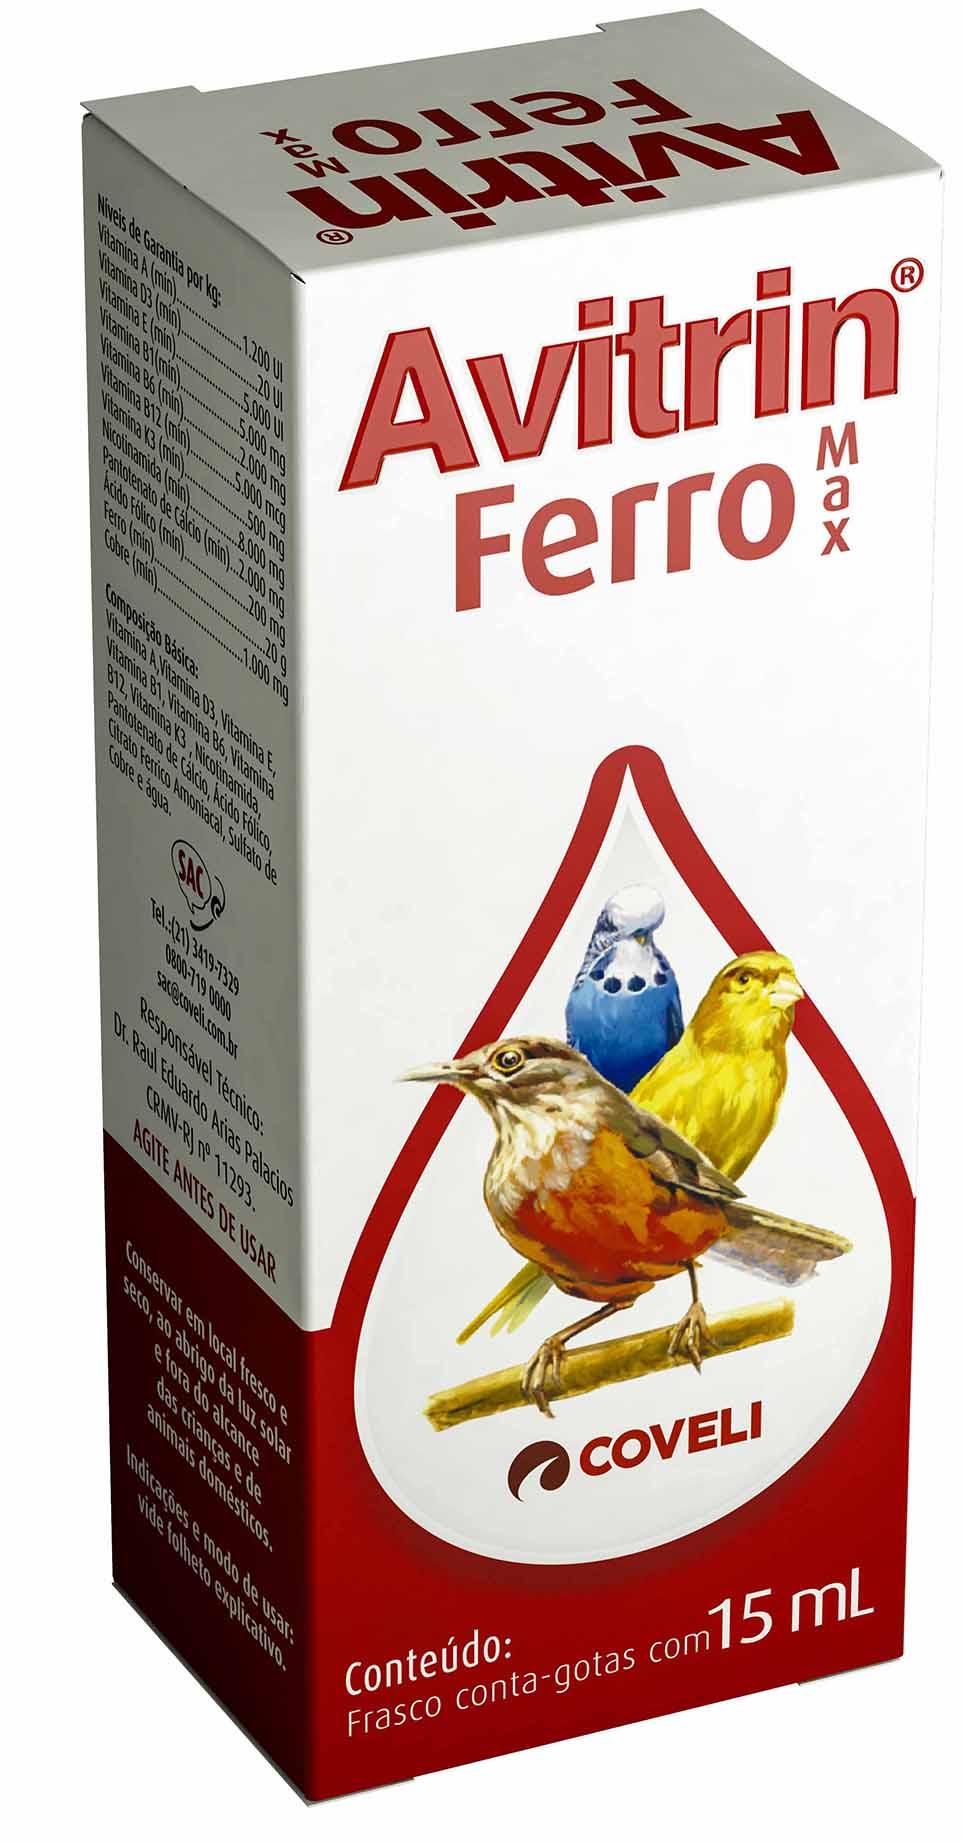 Avitrin Ferro Max 15ml Aves Suplemento Vitamínico Coveli